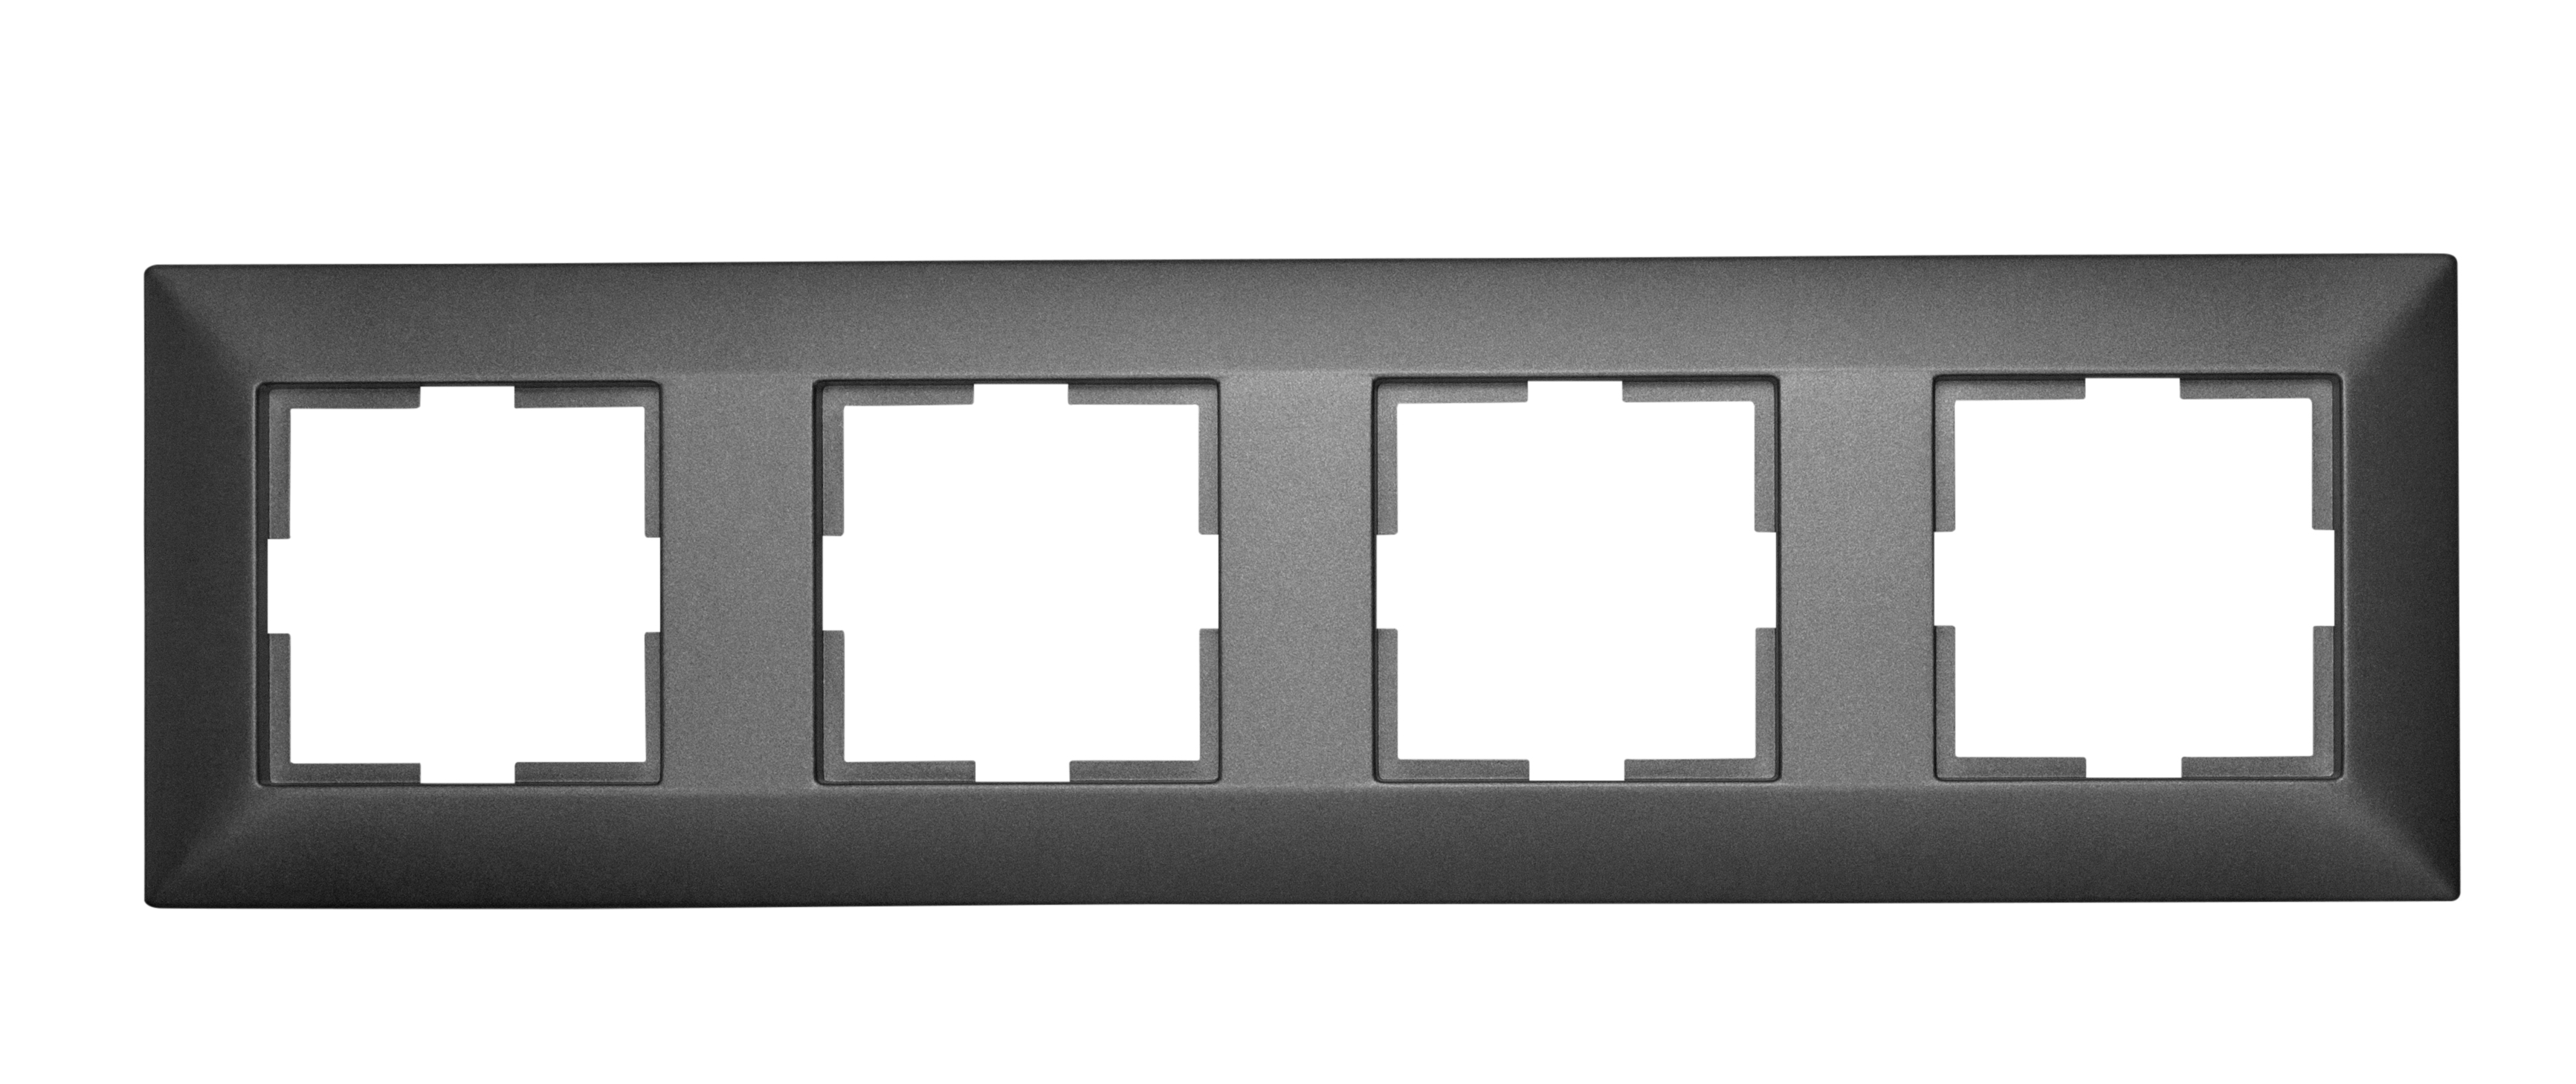 1 Stk Rahmen 4-fach, anthrazit EV115004--